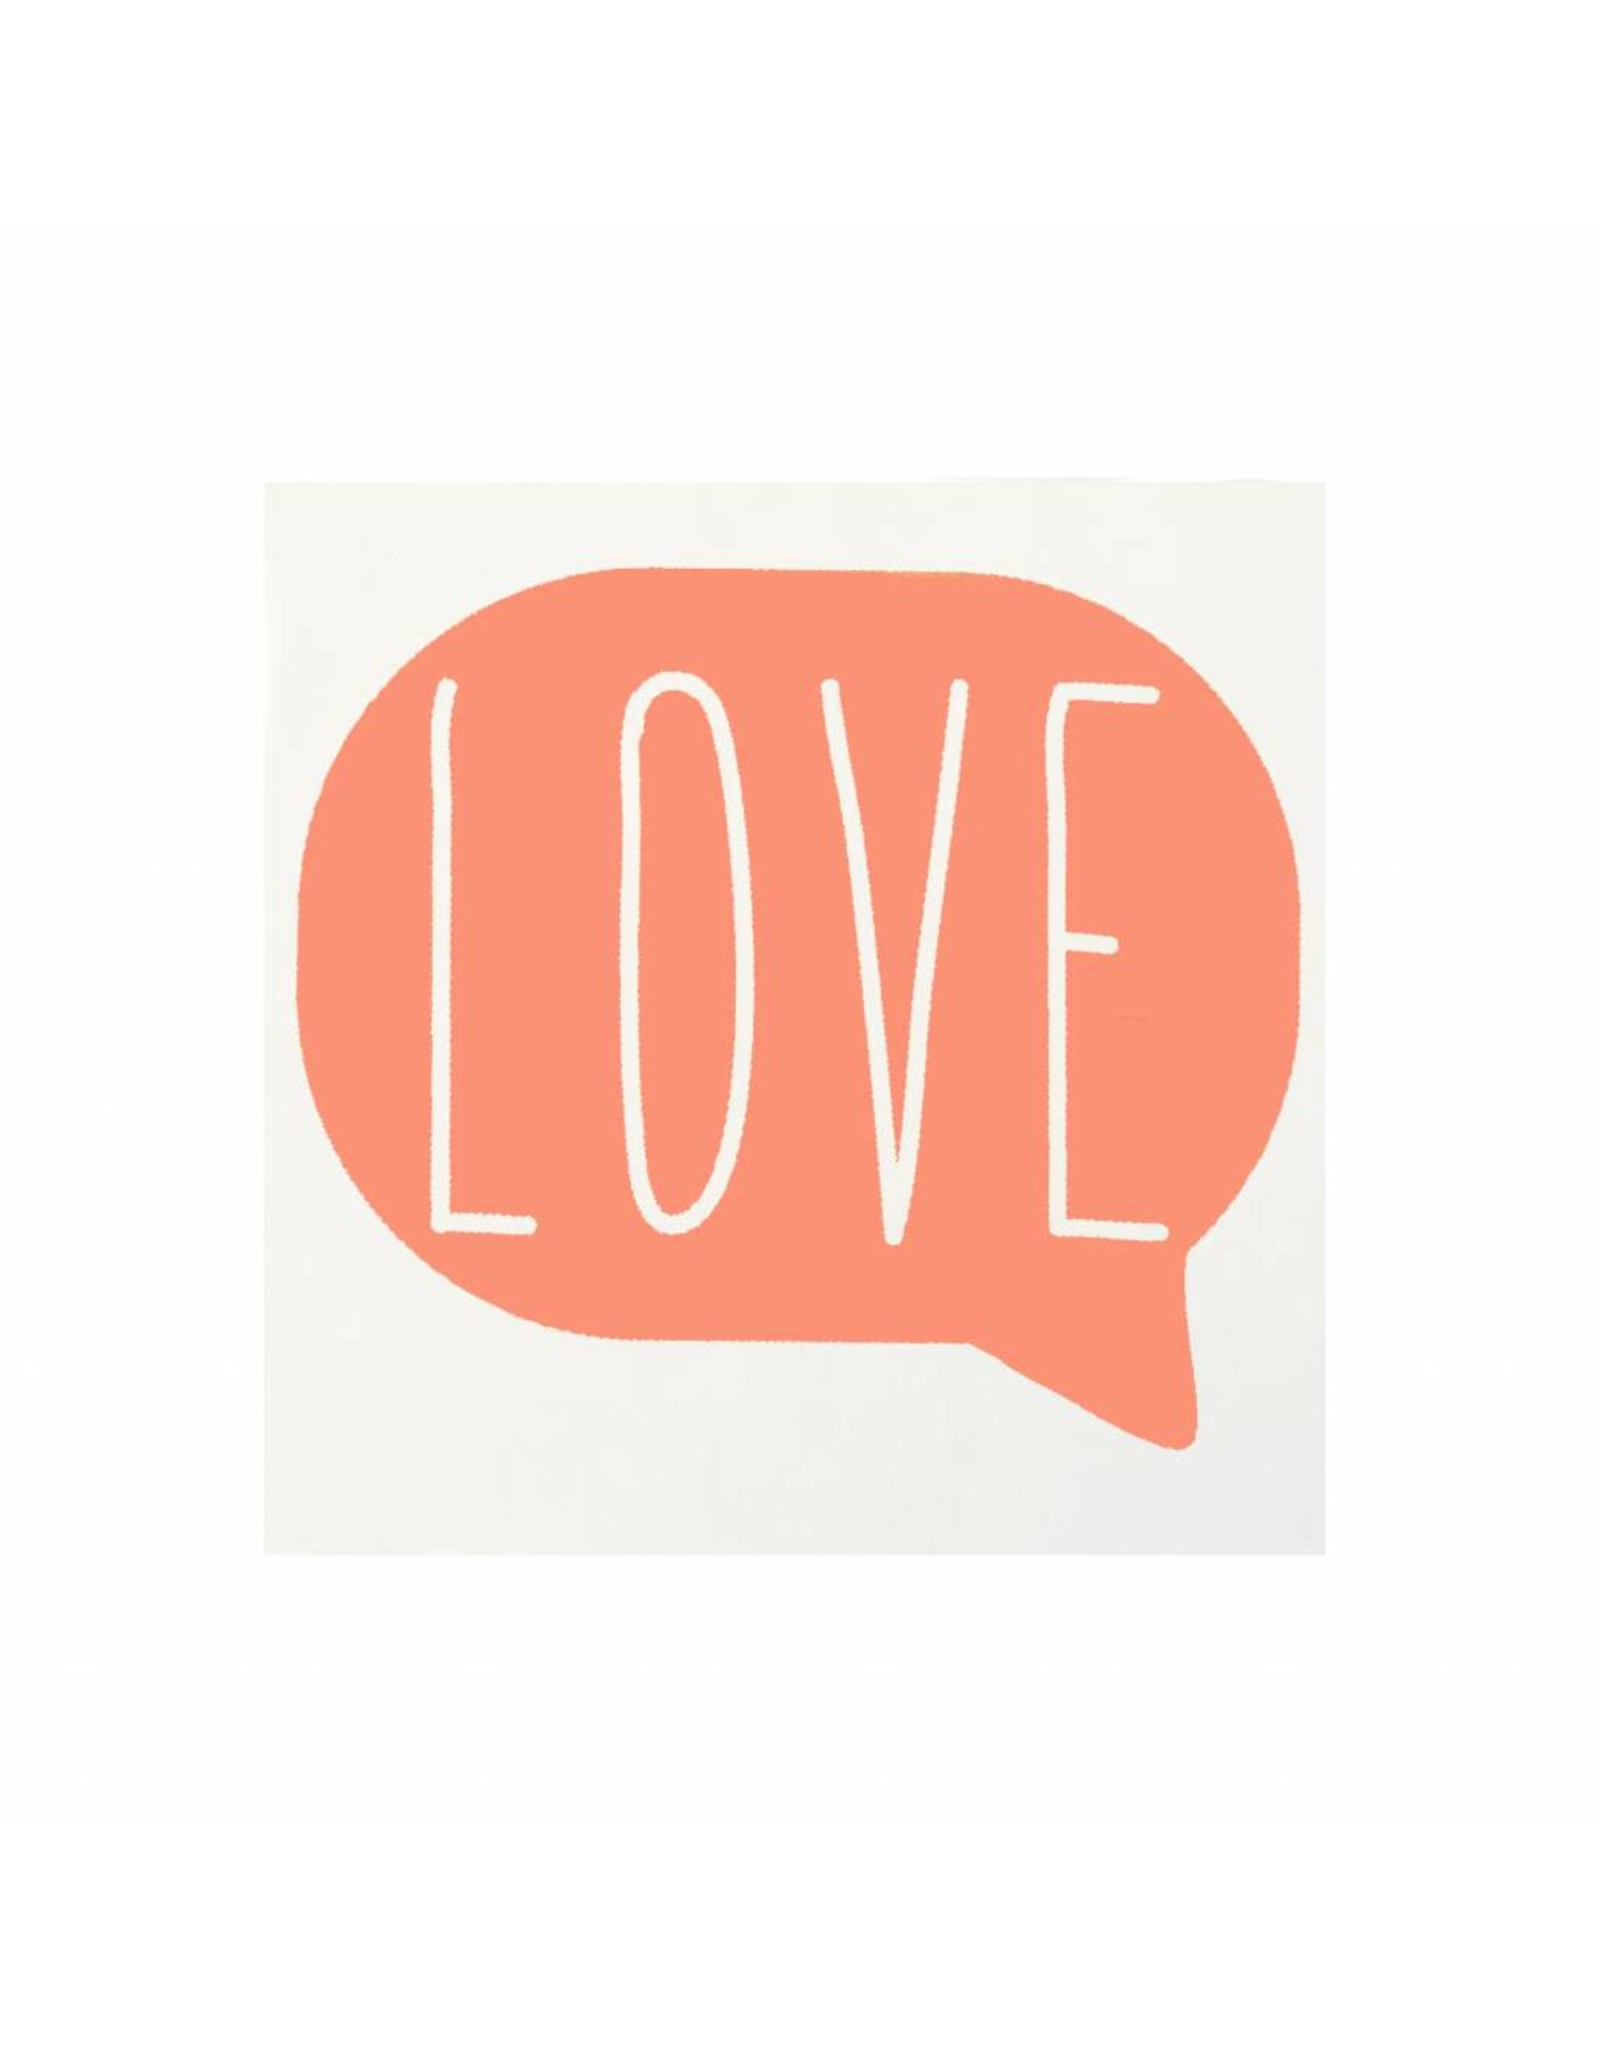 Stickers 5 st. LOVE koraal